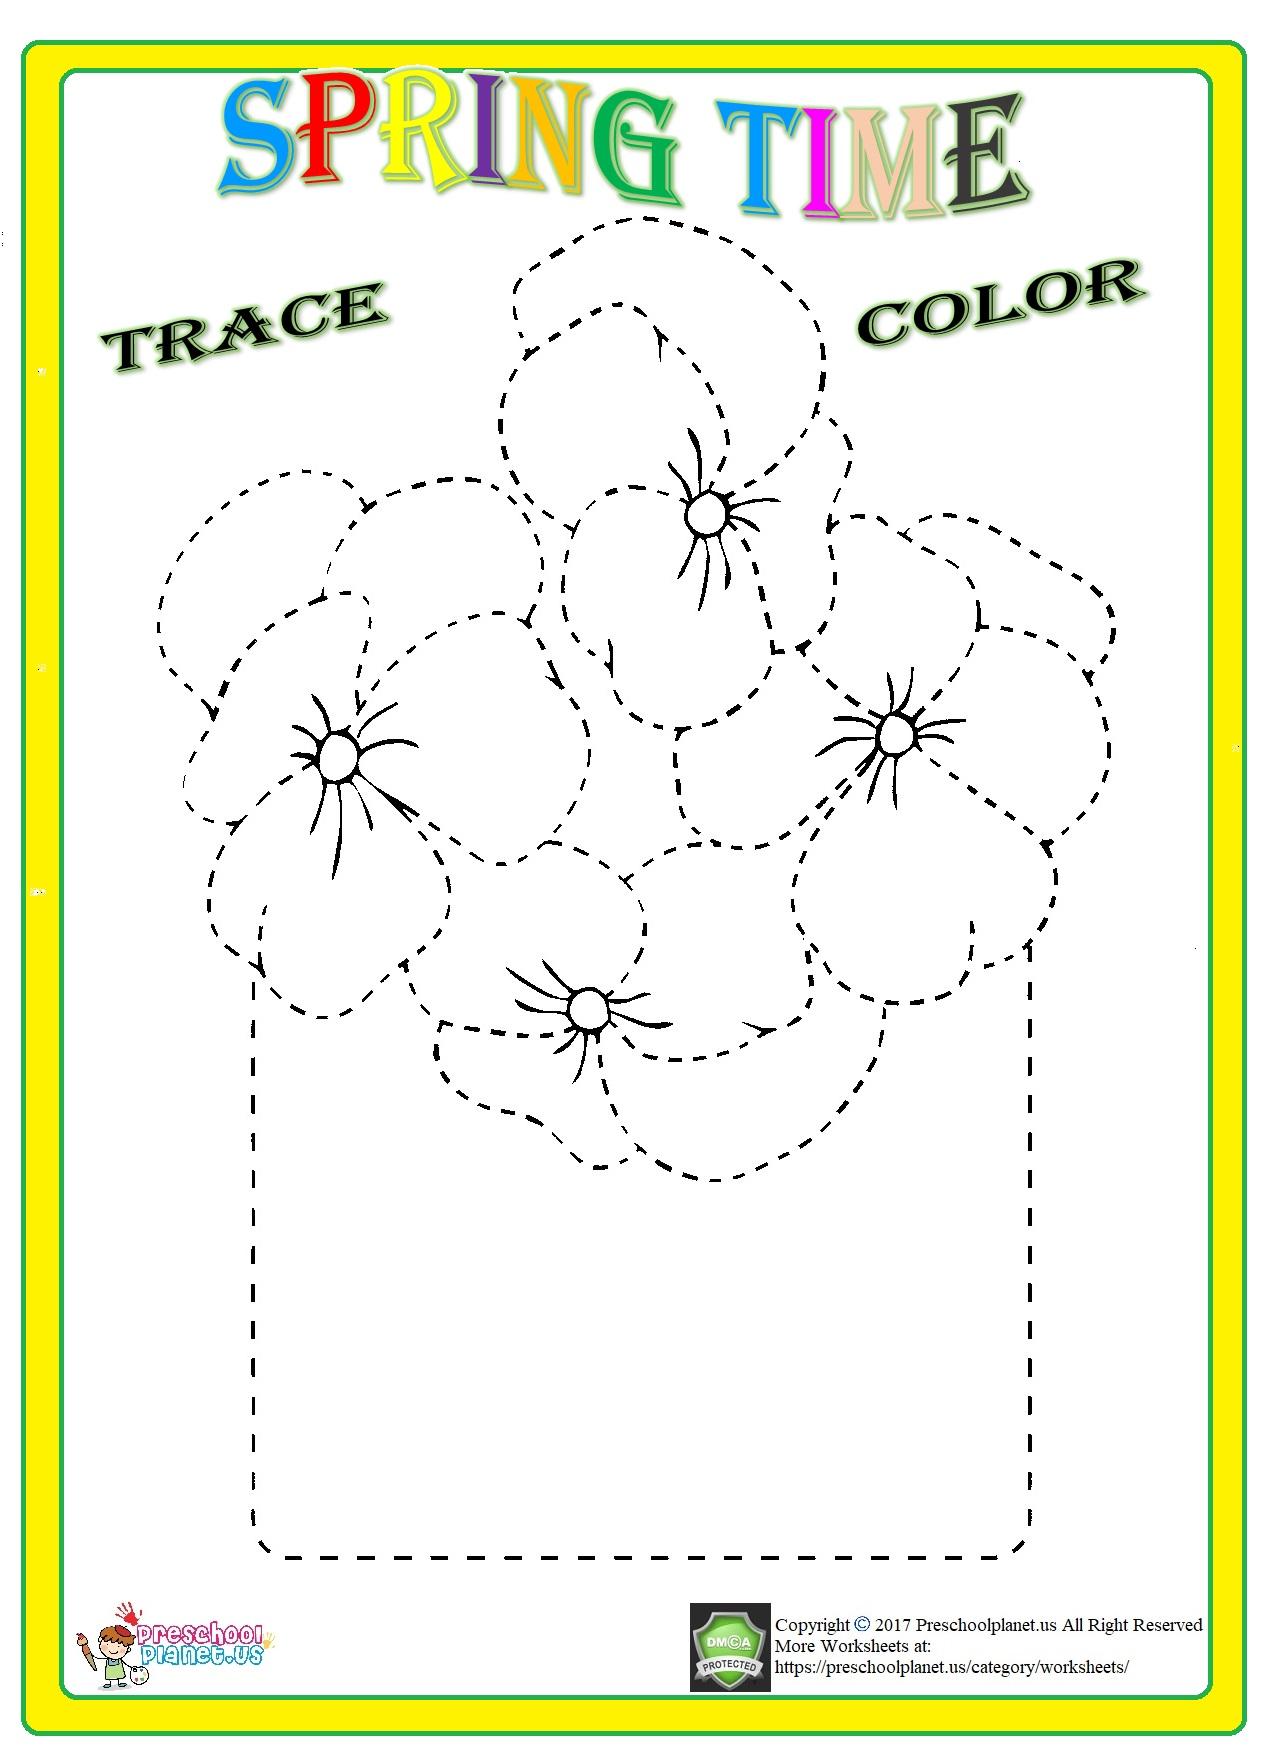 Spring Graph Worksheet For Kids Preschoolplanet